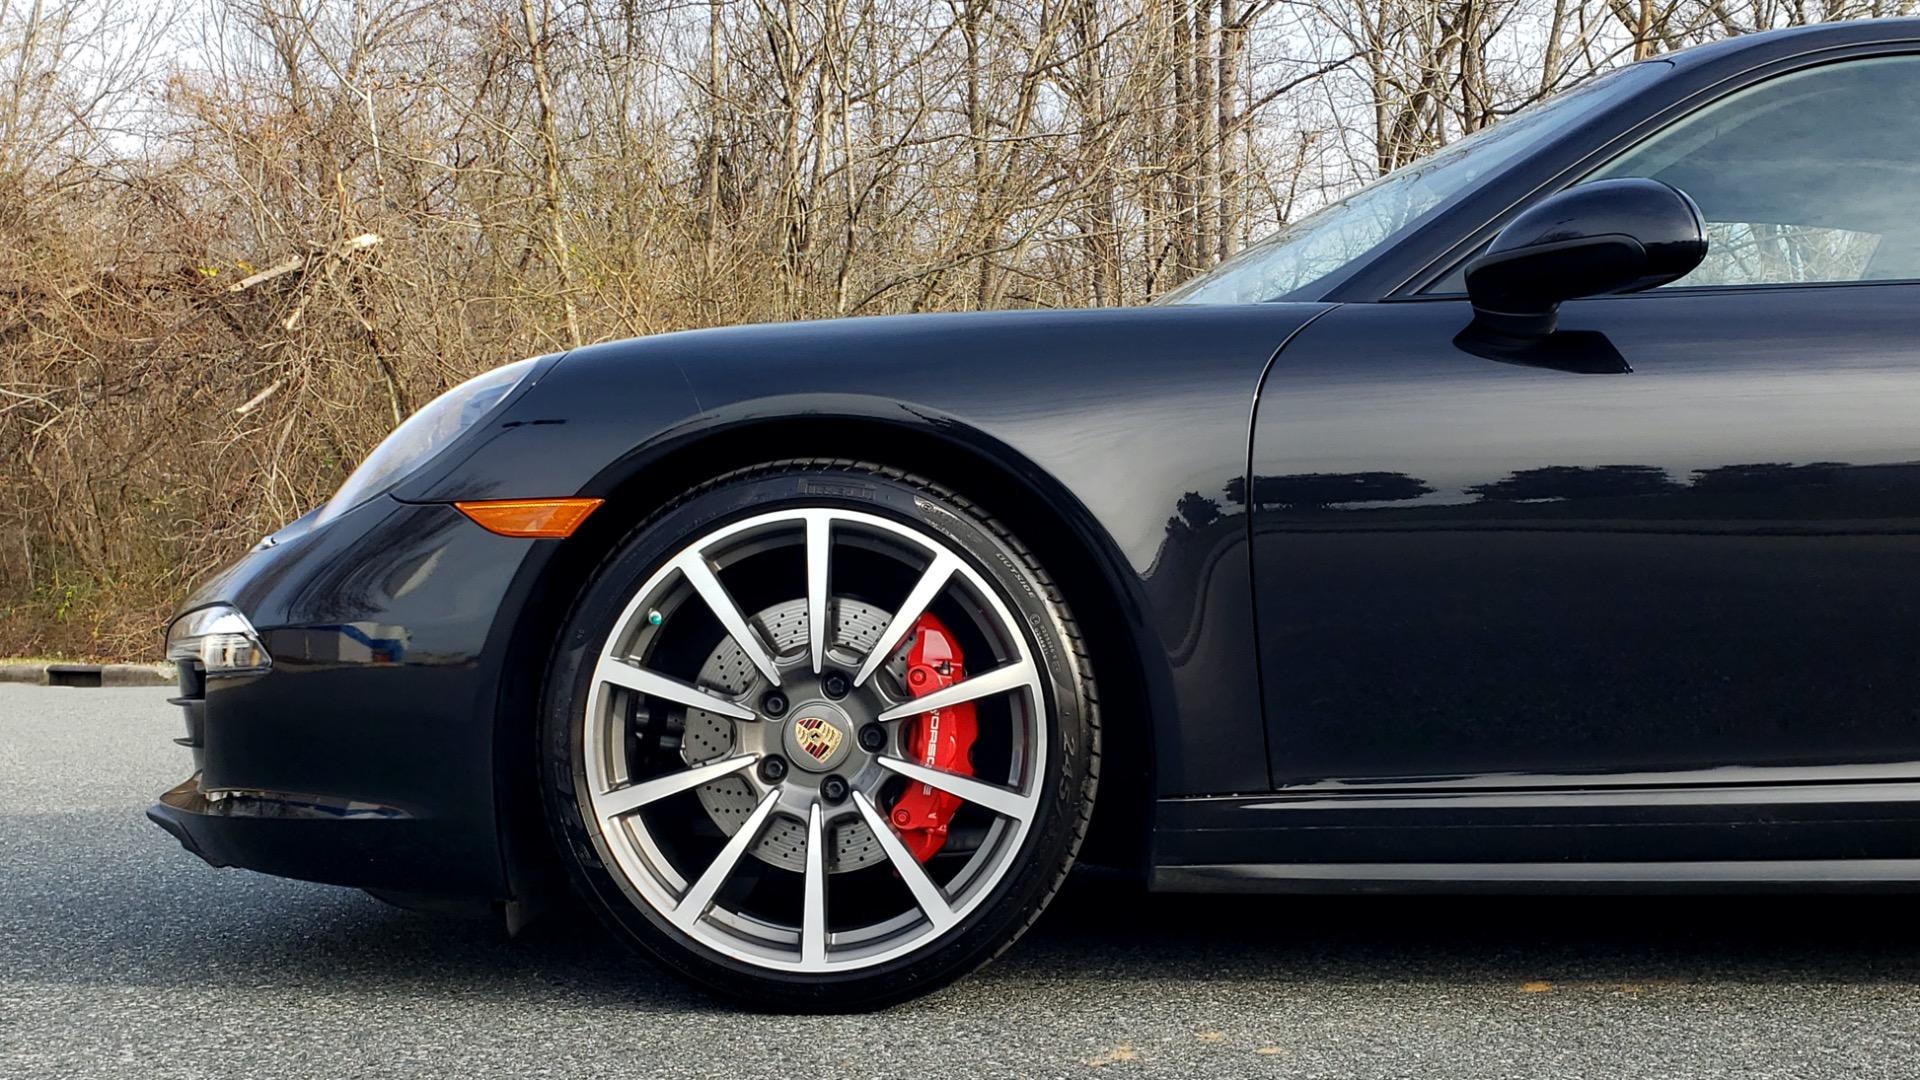 Used 2014 Porsche 911 CARRERA 4S / PREM PKG PLUS / NAV / SUNROO / BOSE / CHRONO for sale Sold at Formula Imports in Charlotte NC 28227 70